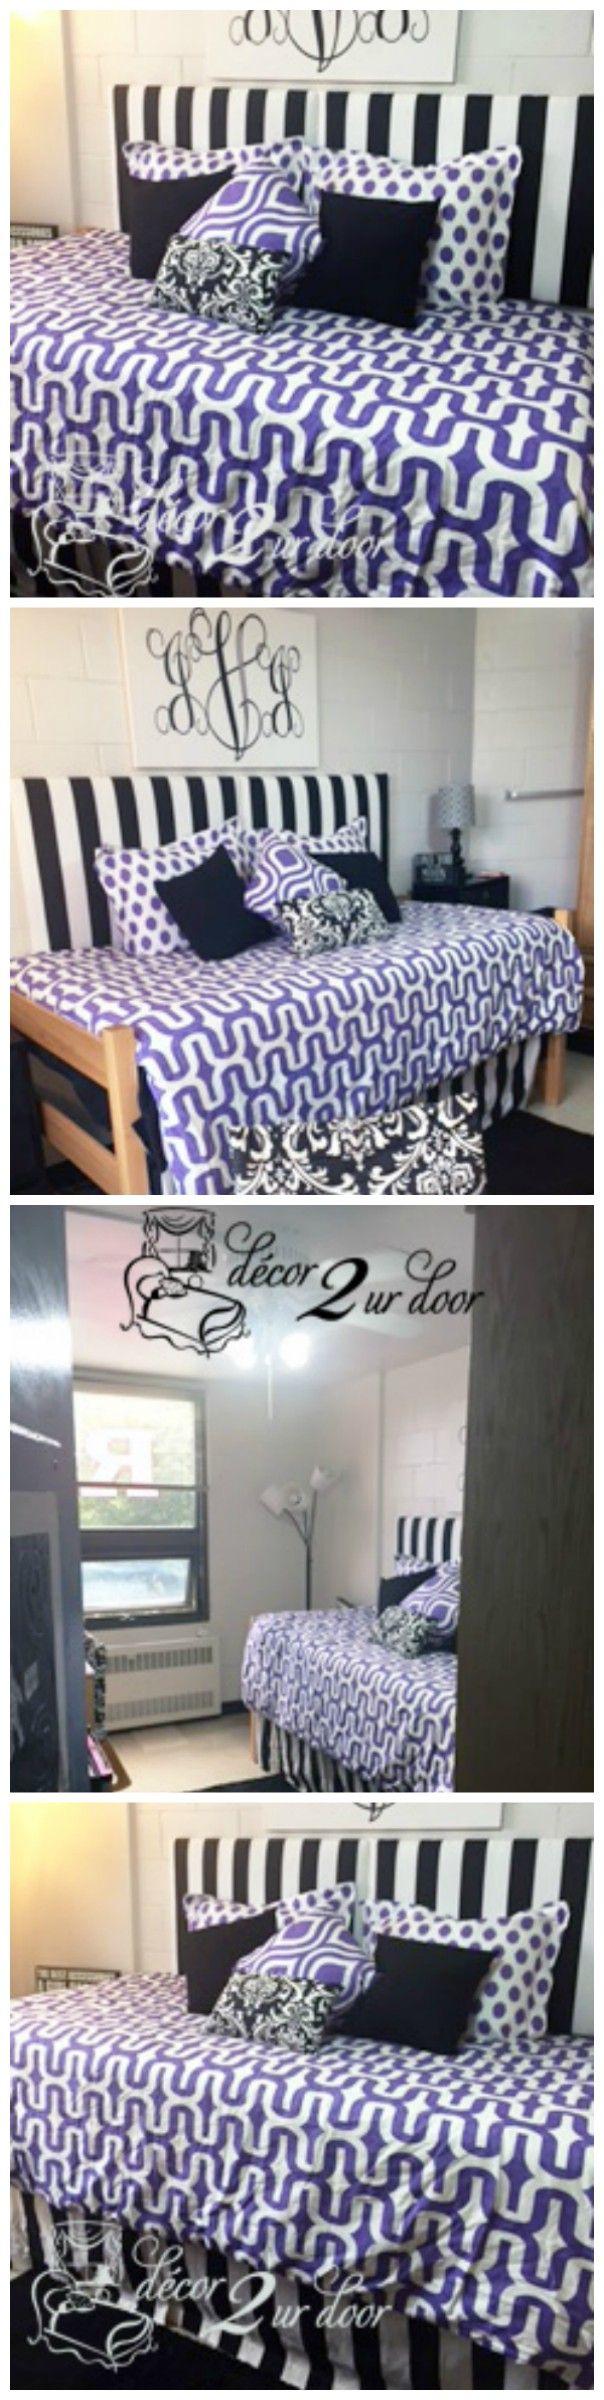 Designer Dorm Headboard, Dorm Bed Scarf, Dorm Bed Skirt/dorm Dust Ruffle,  Monogram Dorm Room Pillows, Dorm Room Window Treatment, Lofted Dorm Bed  Décor, ...